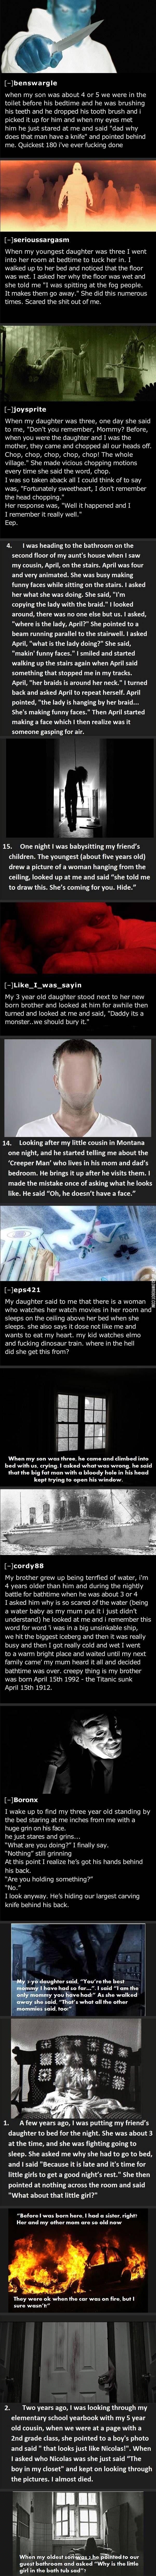 Kids say the darndest things. So, so creepy....